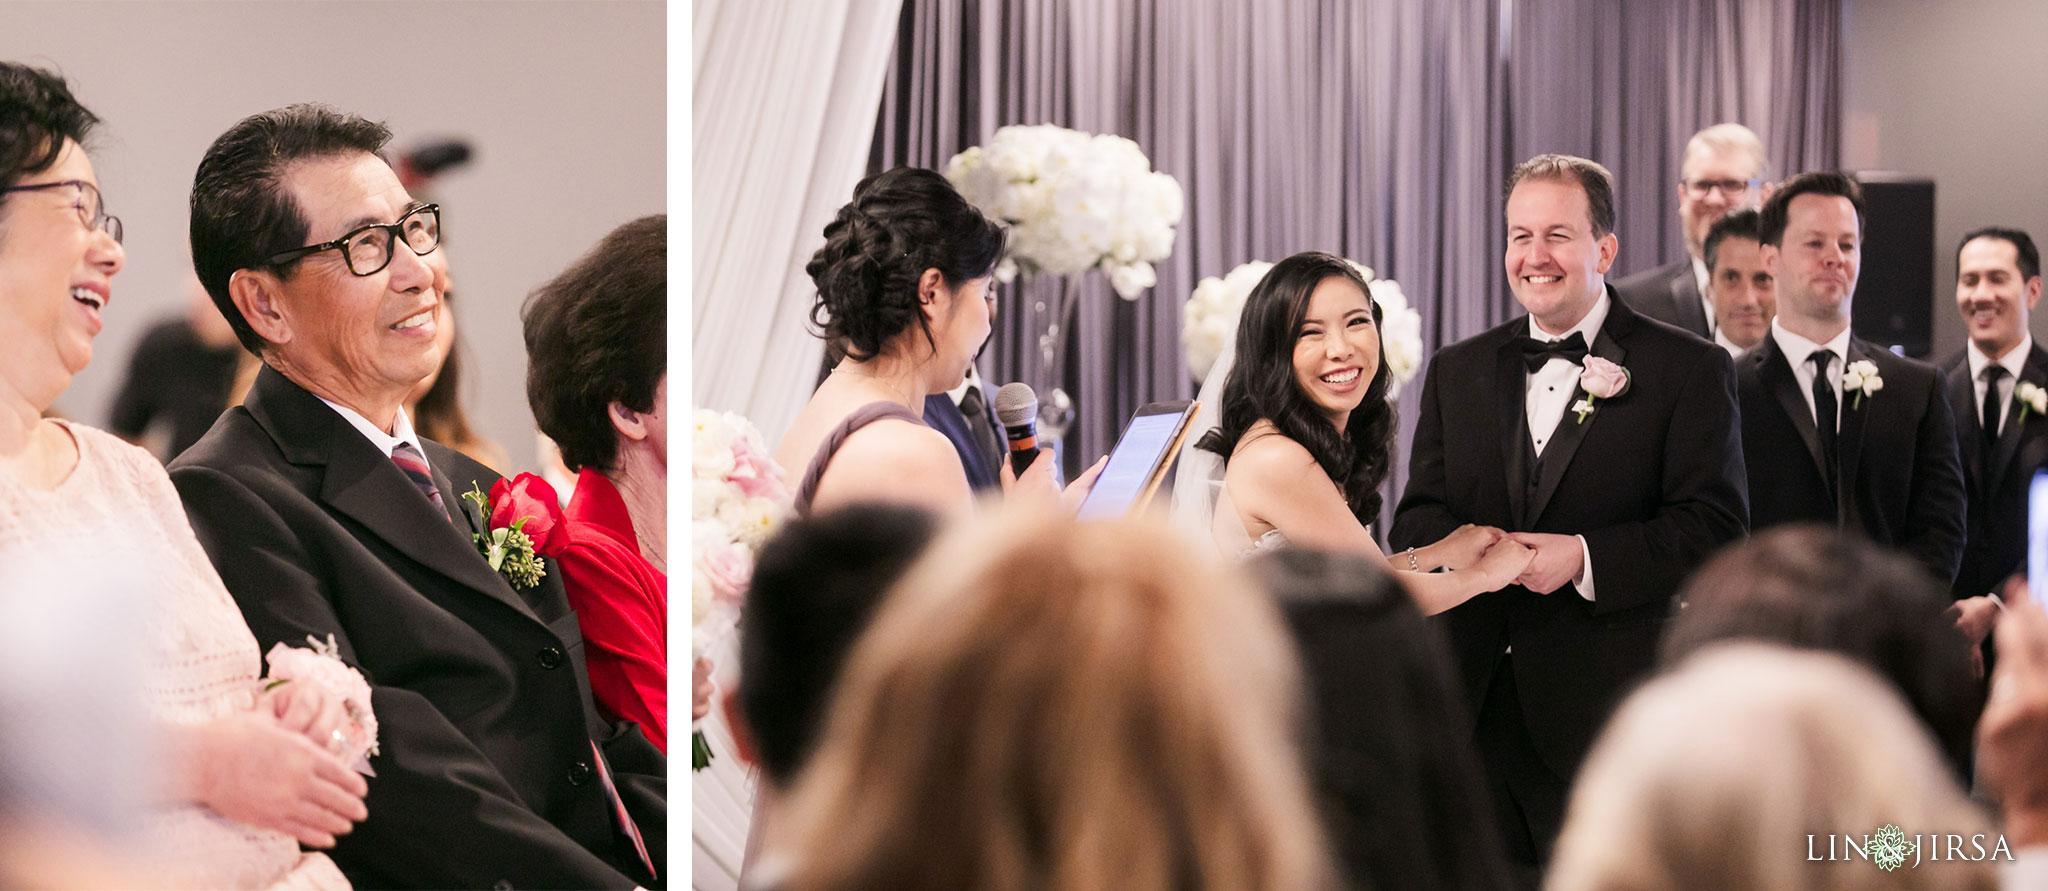 23 vertigo banquet hall glendale wedding photography